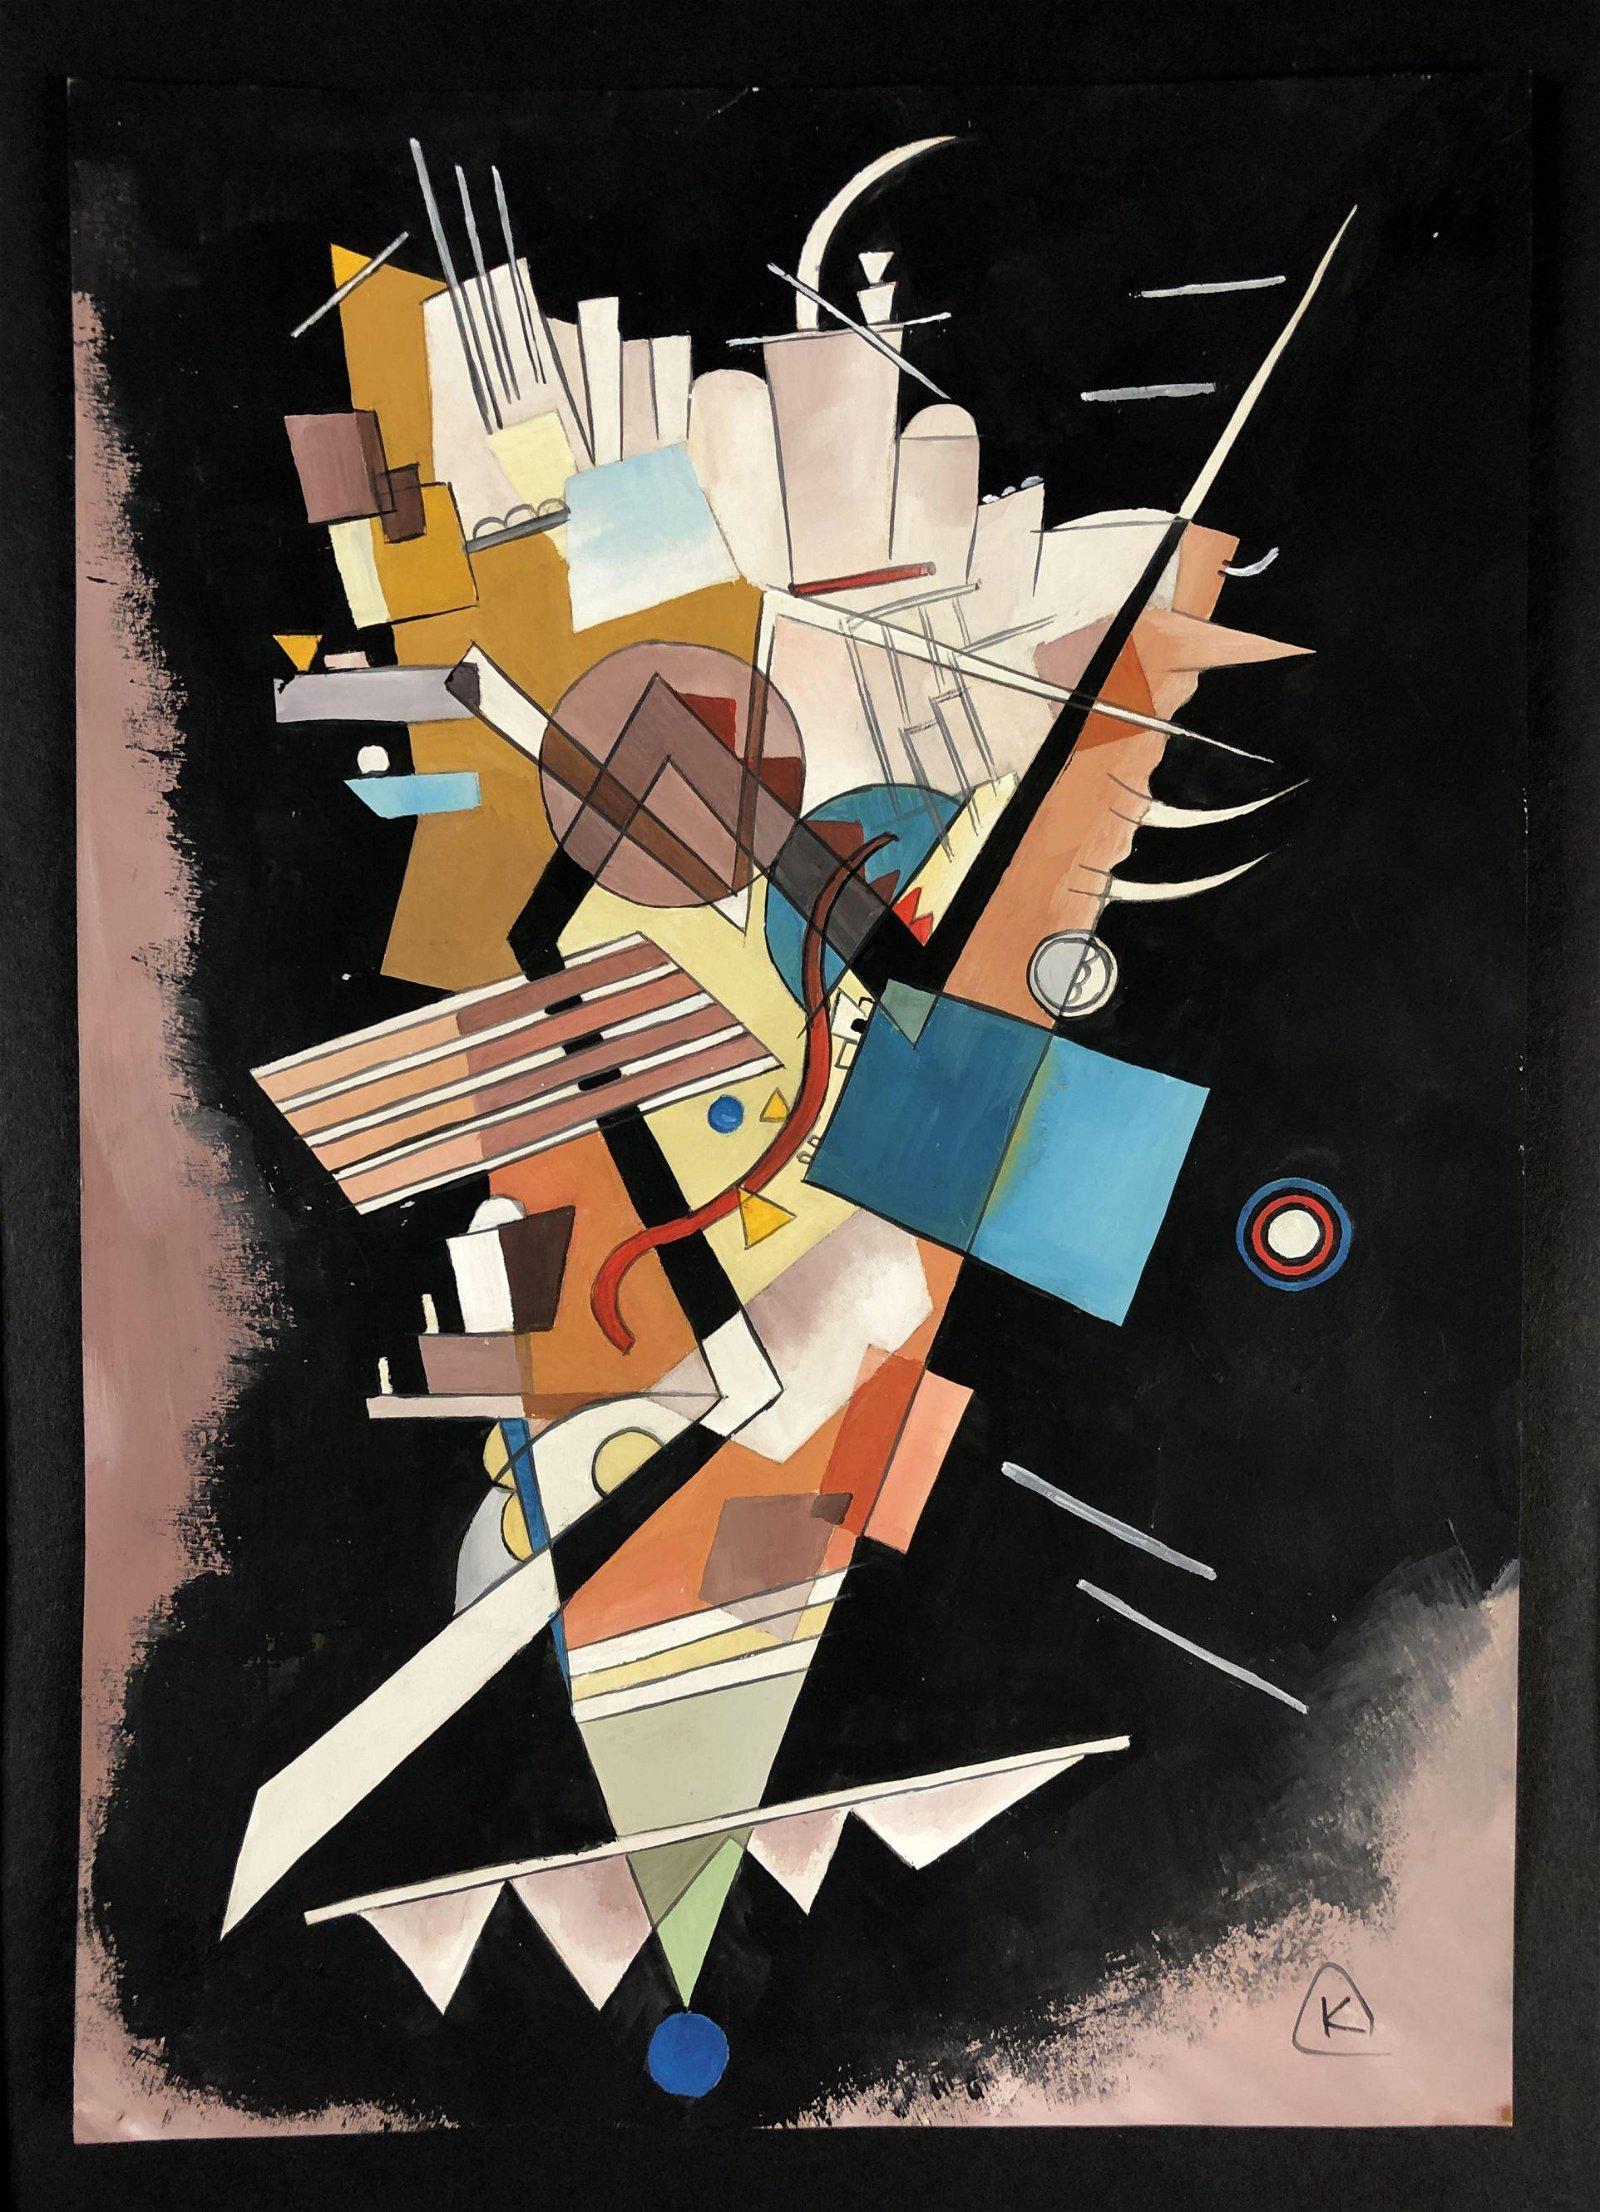 Wassily Kandinsky (1866-1944) - Mixed Media Drawing